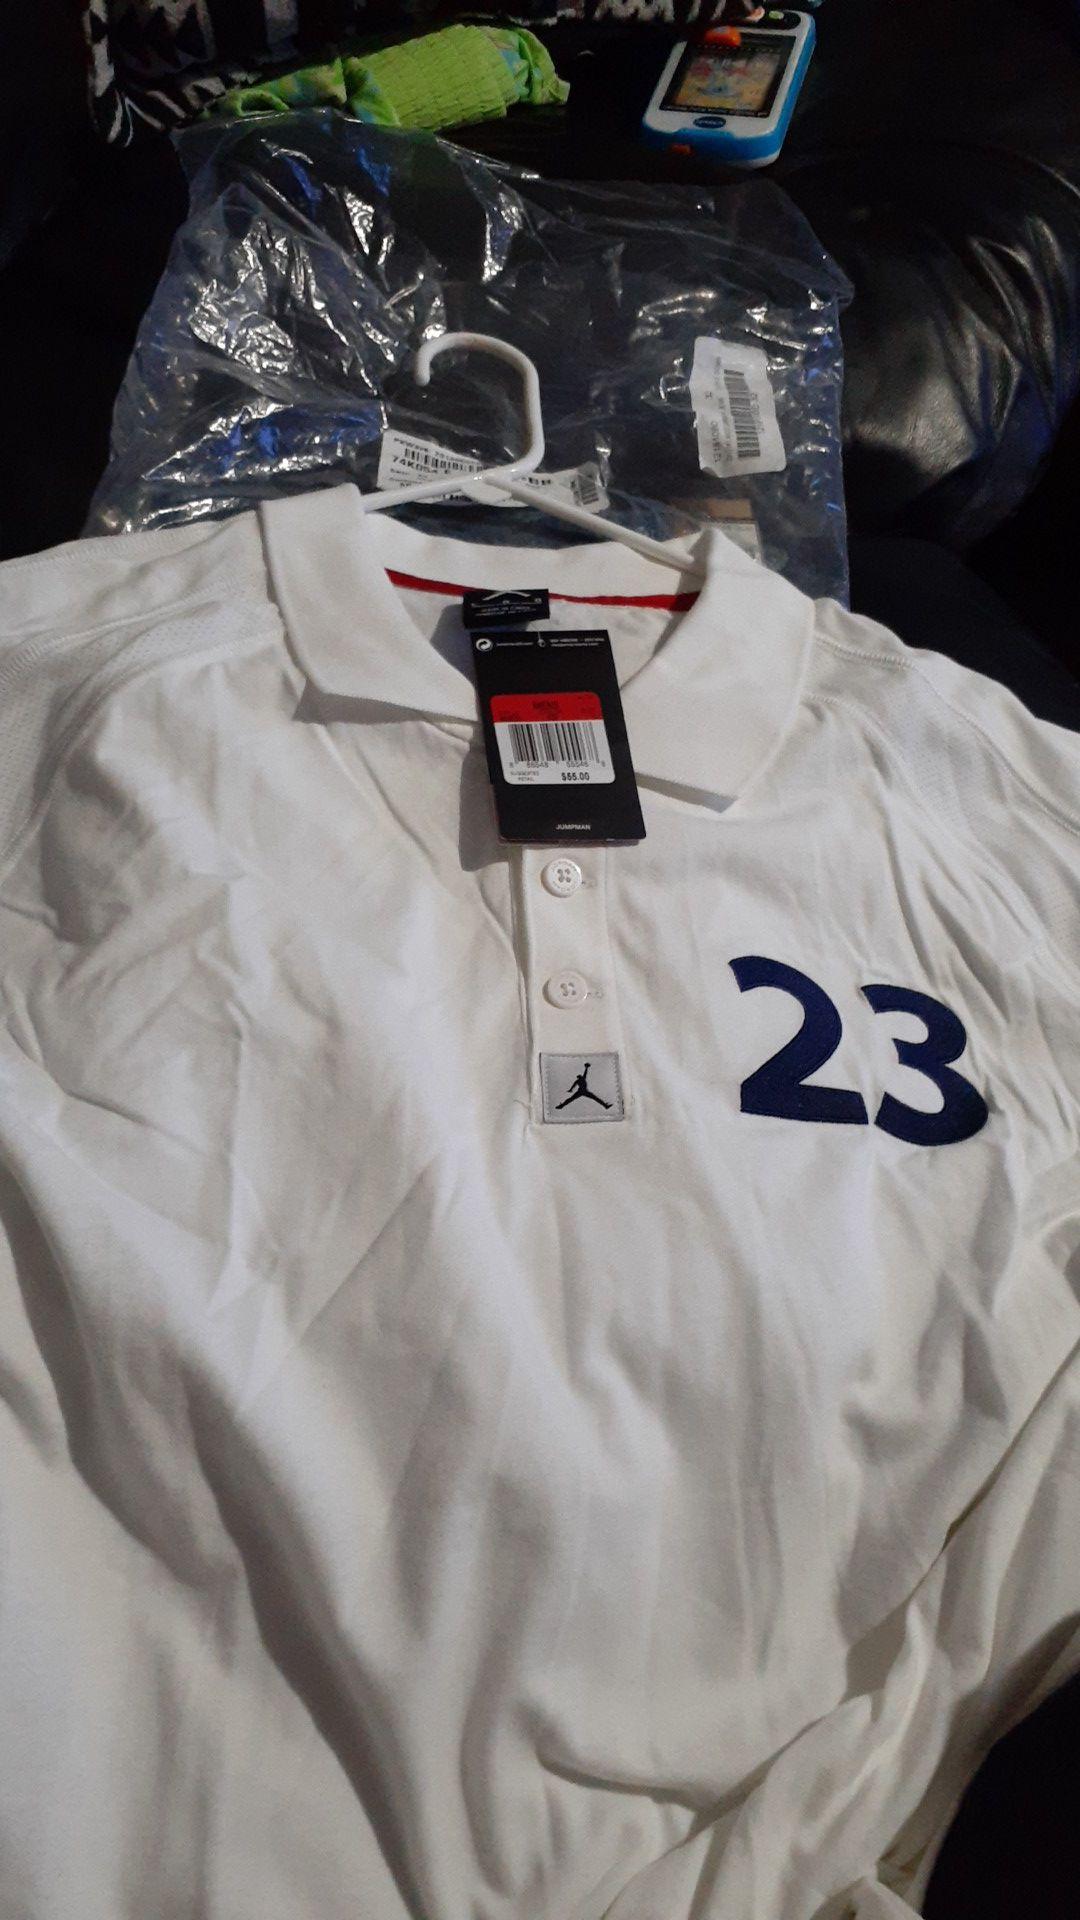 Brand new mens Jordan retro 12 white/royal blue polo shirt 30 obo